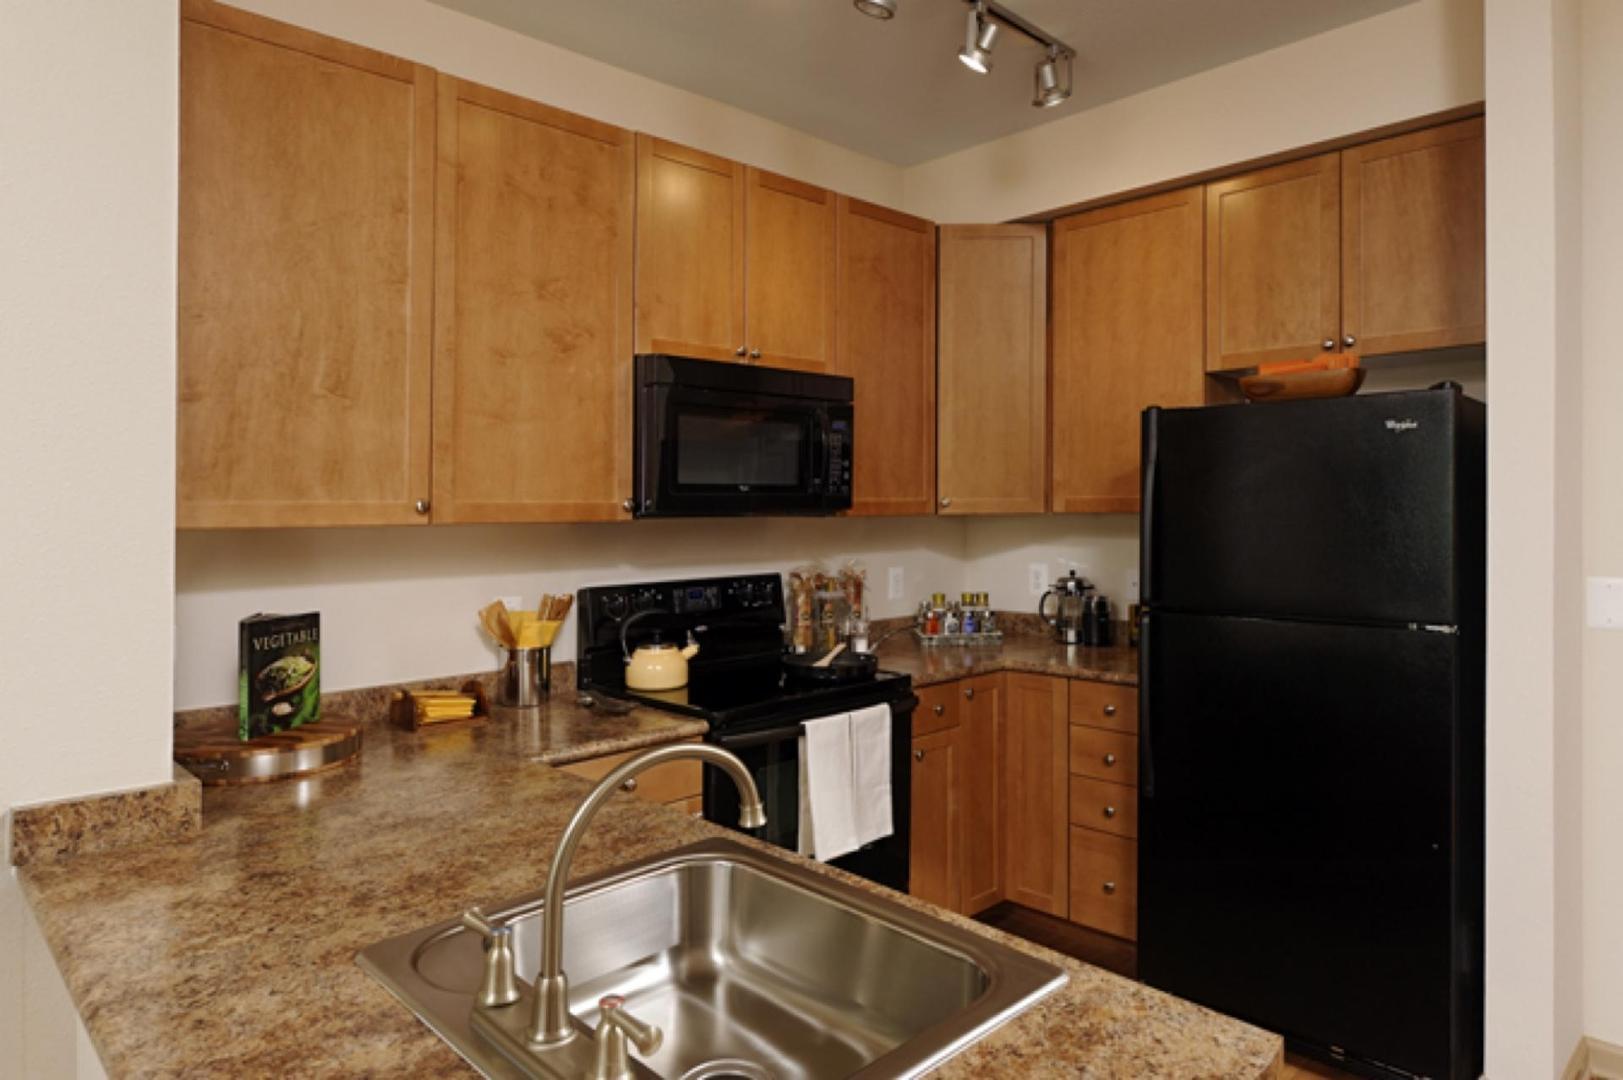 8100 Gibbs Way #410-4075, Landover, MD - 1,504 USD/ month